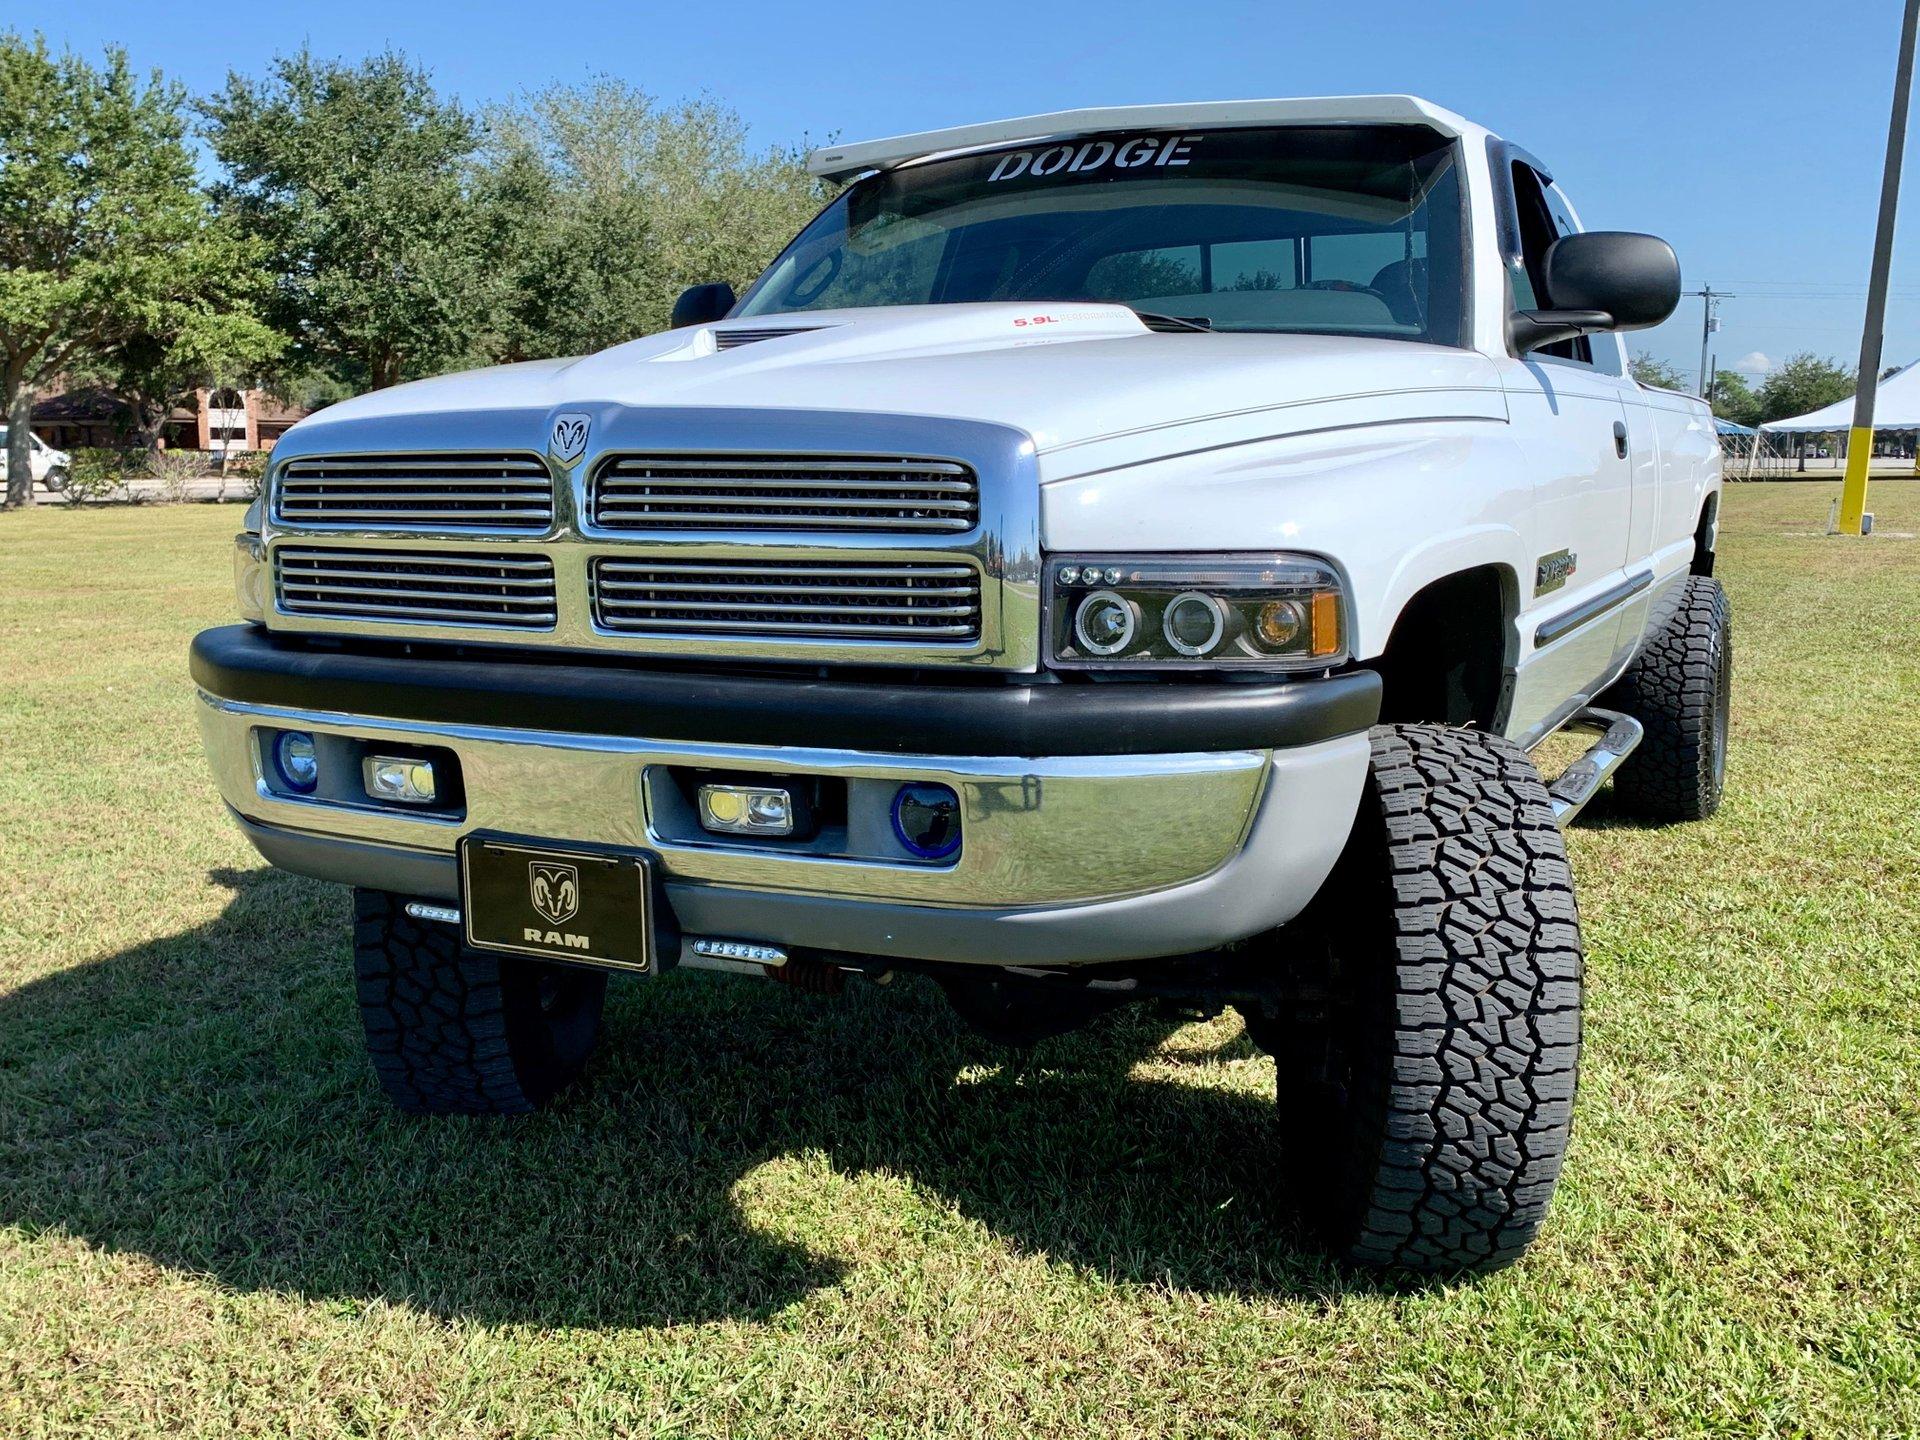 2001 dodge ram 2500 3 4 ton 4x4 pickup